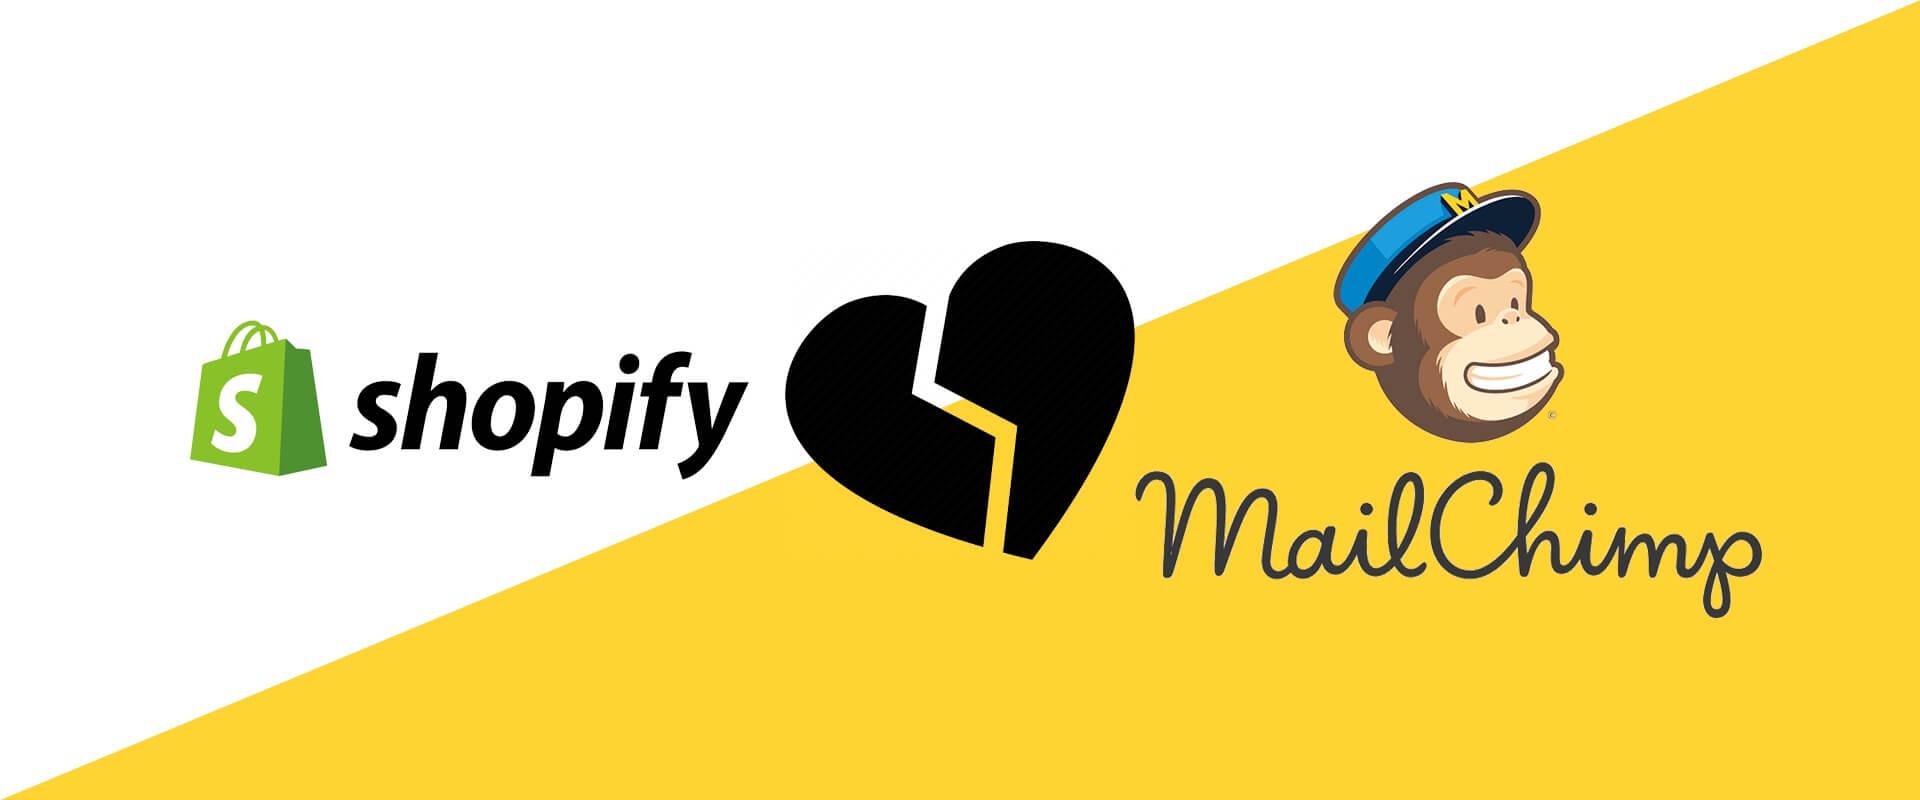 mailchimp rimuove app da shopify